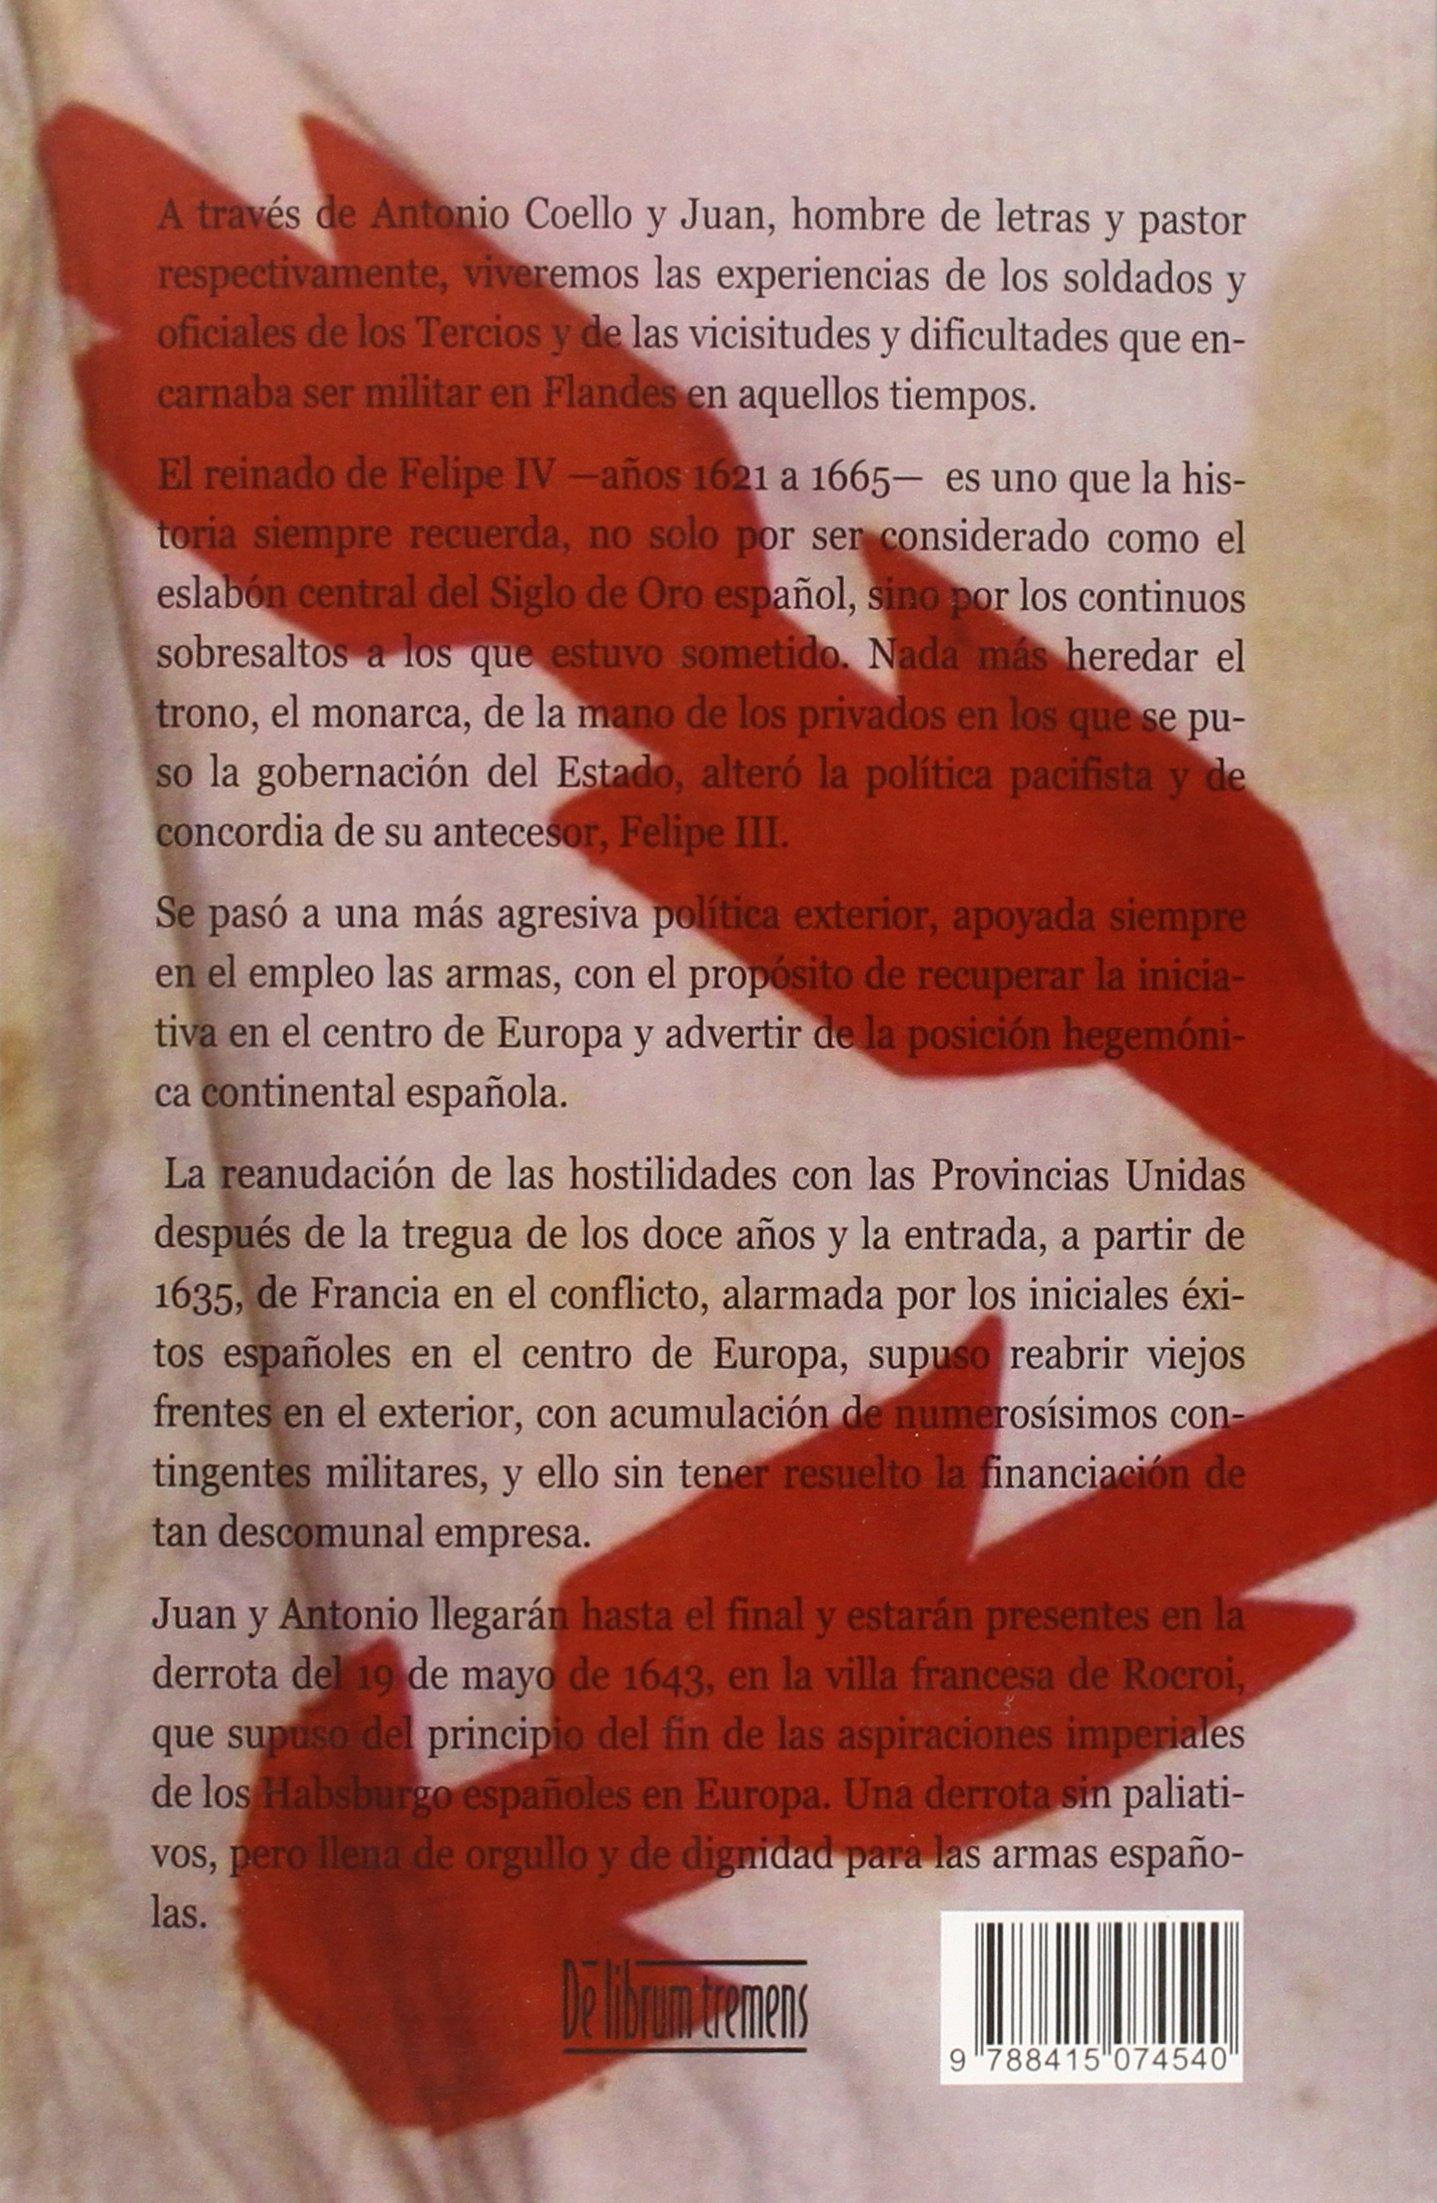 Rocroi (Novela Historica (librum)): Amazon.es: Manuel Cebrian ...